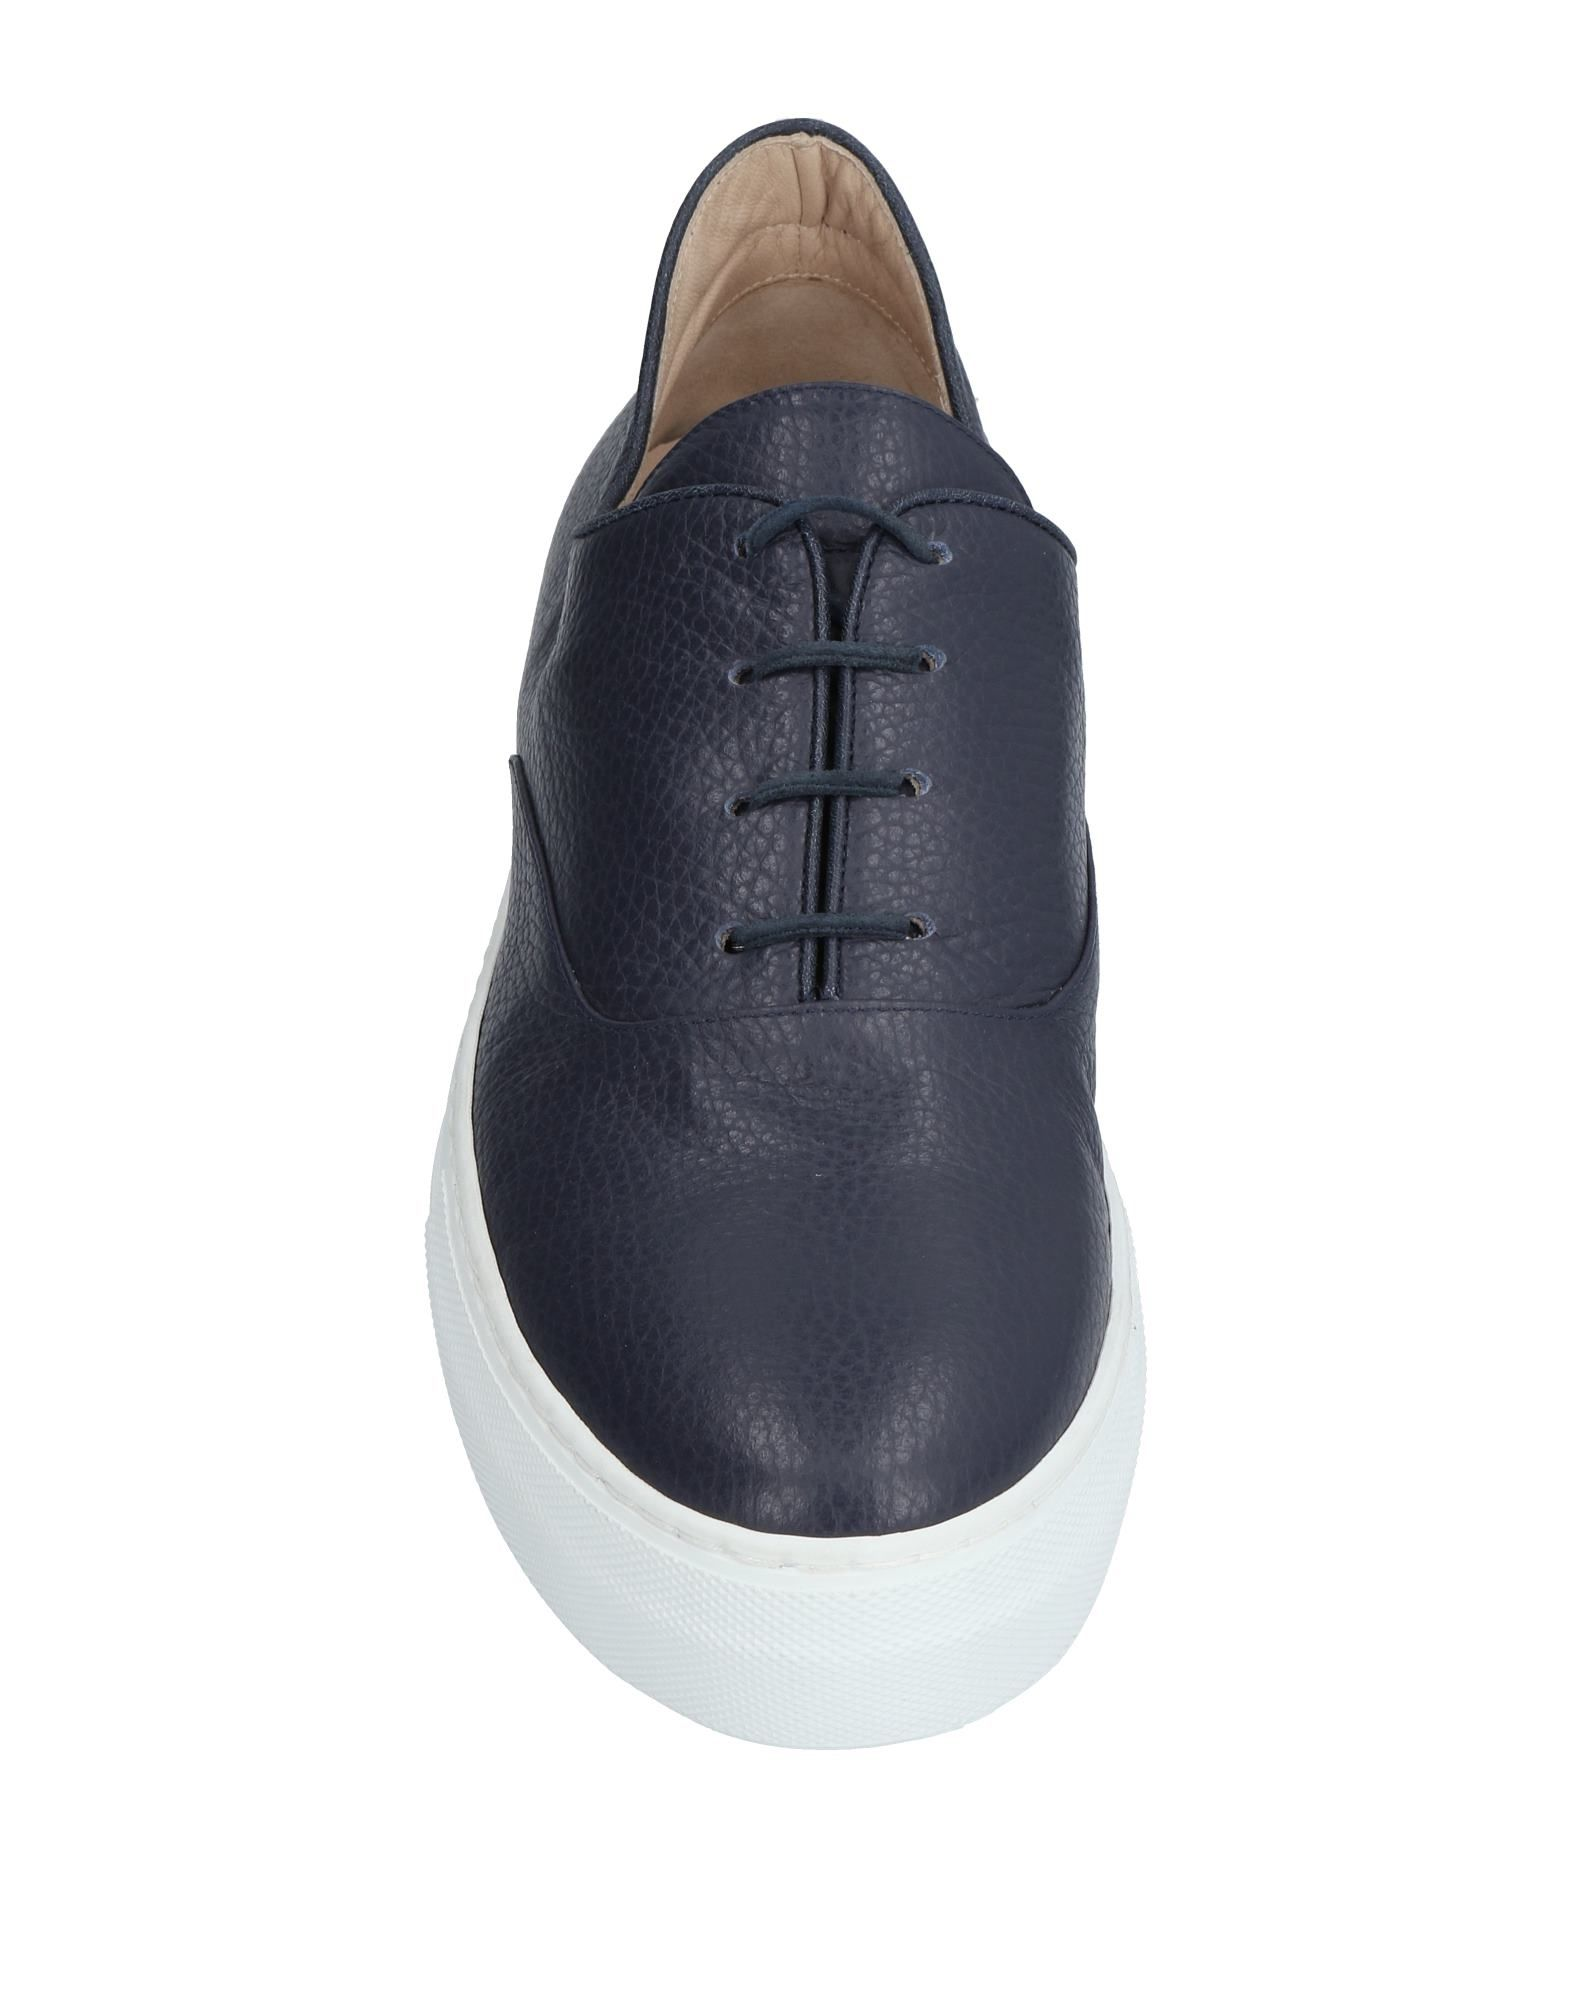 Dibrera By Paolo Zanoli Sneakers Herren beliebte  11445963BS Gute Qualität beliebte Herren Schuhe 6f5943